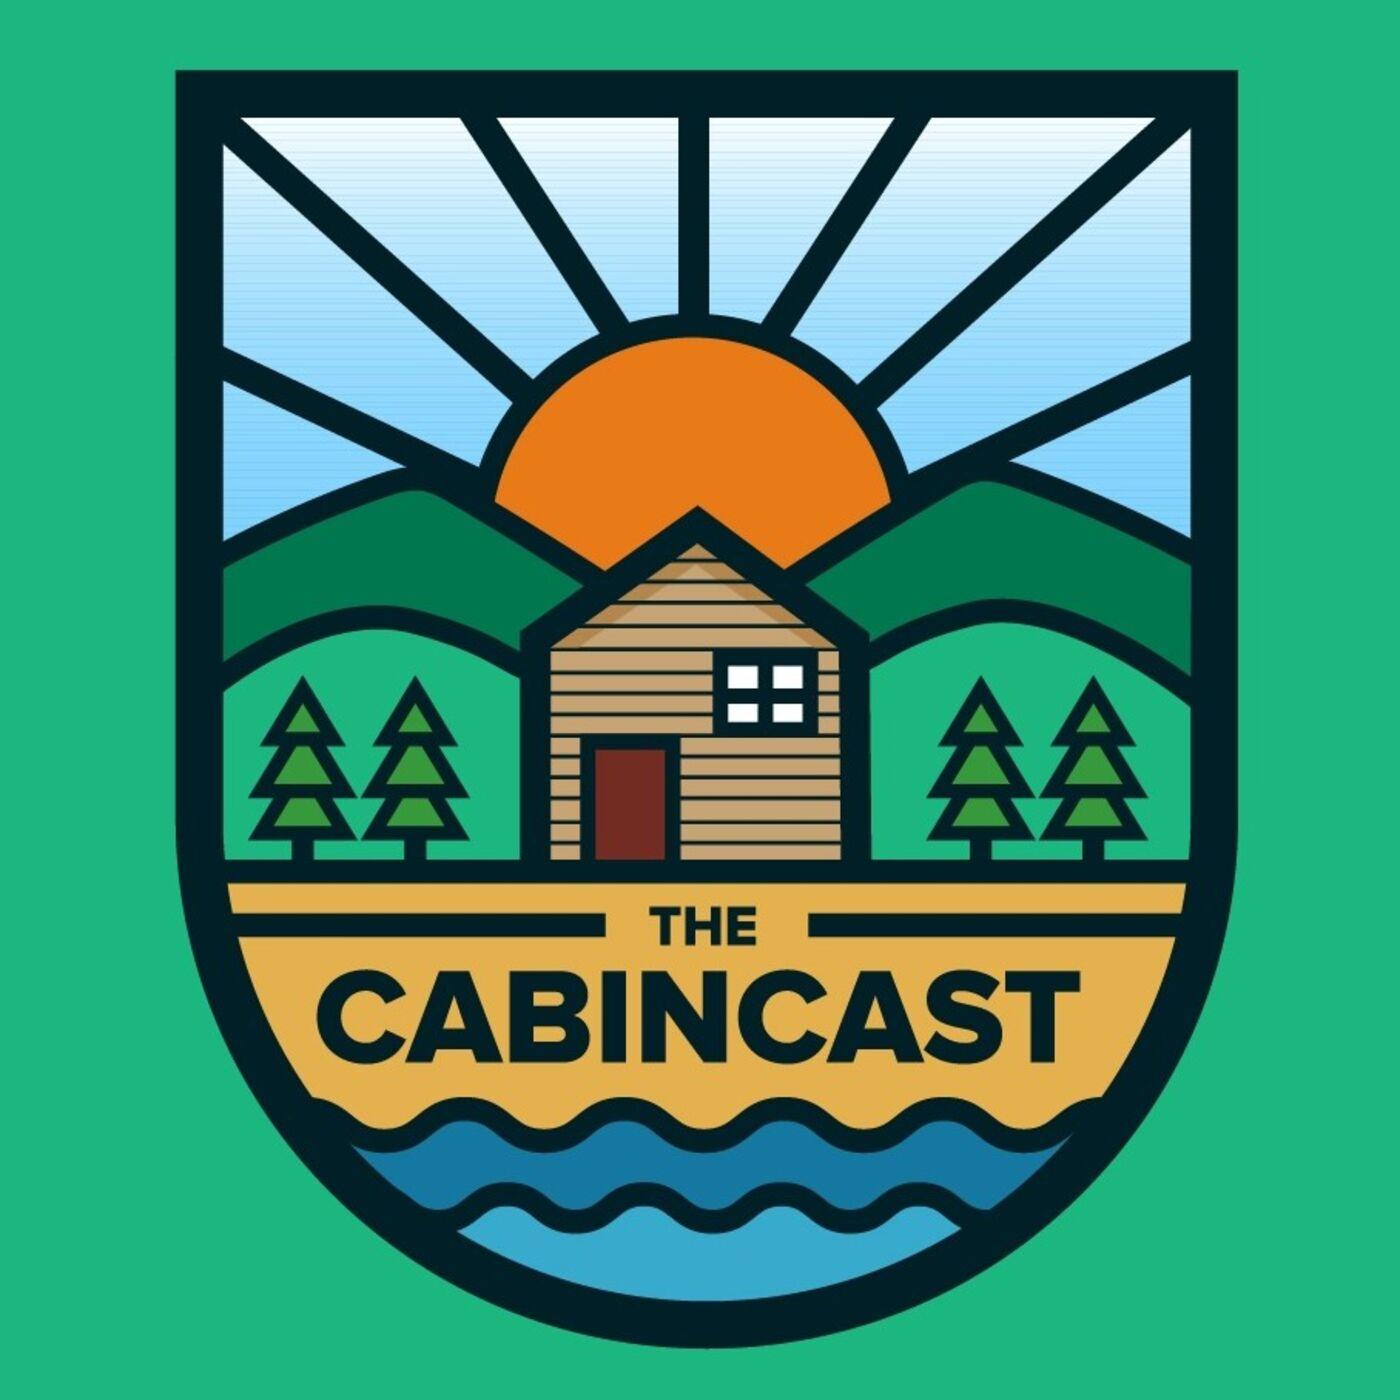 The Cabincast podcast show image